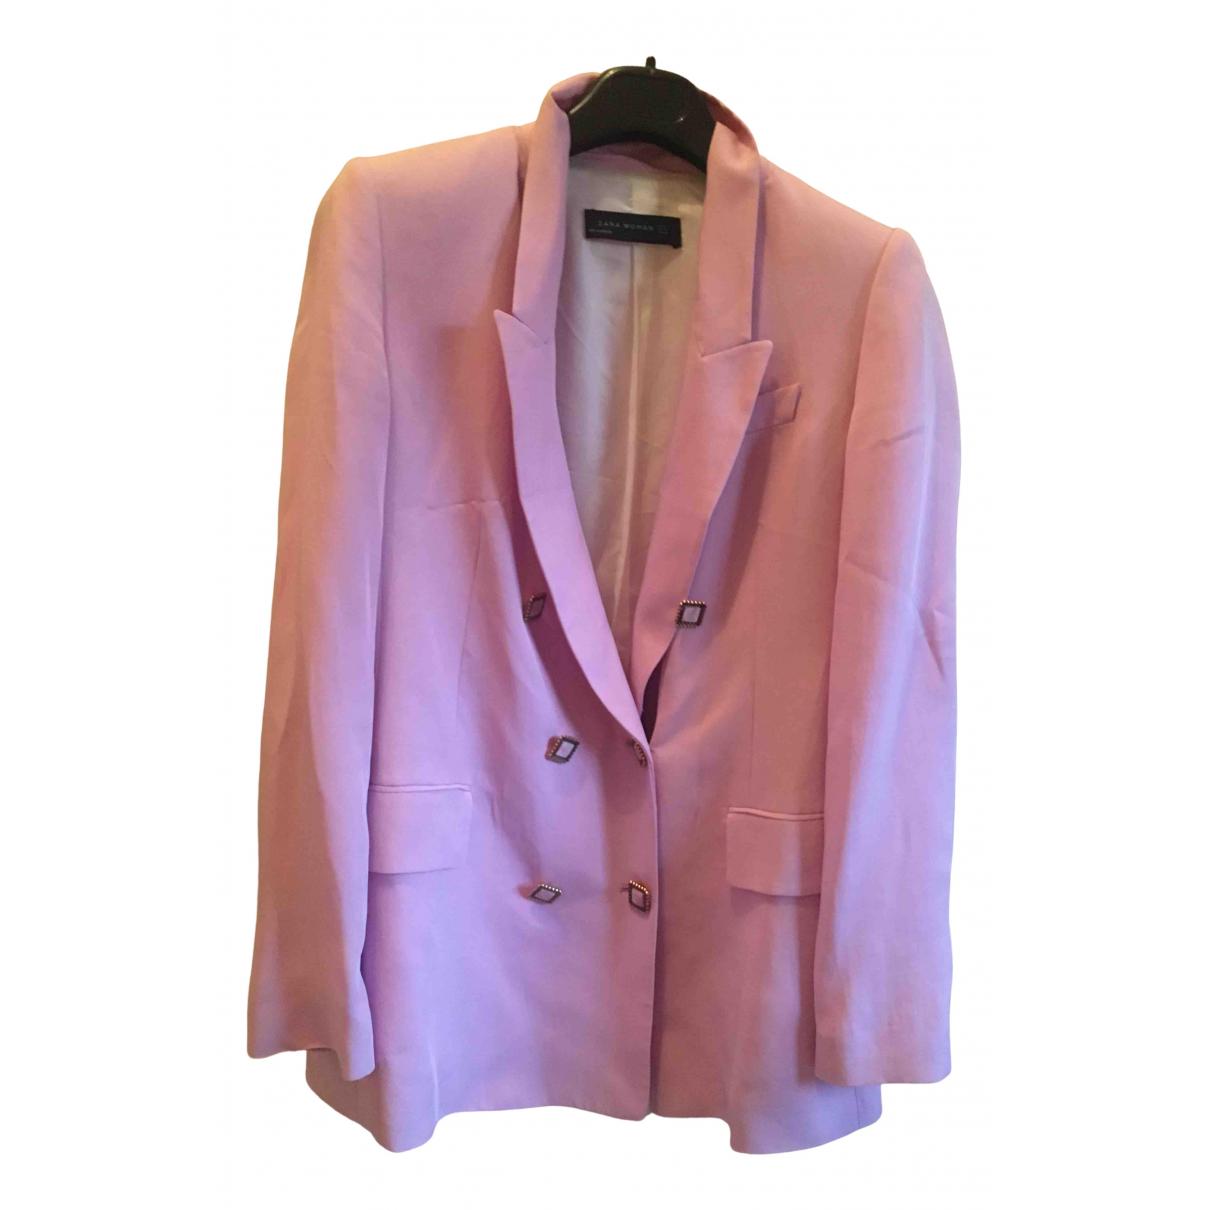 Zara - Veste   pour femme - rose